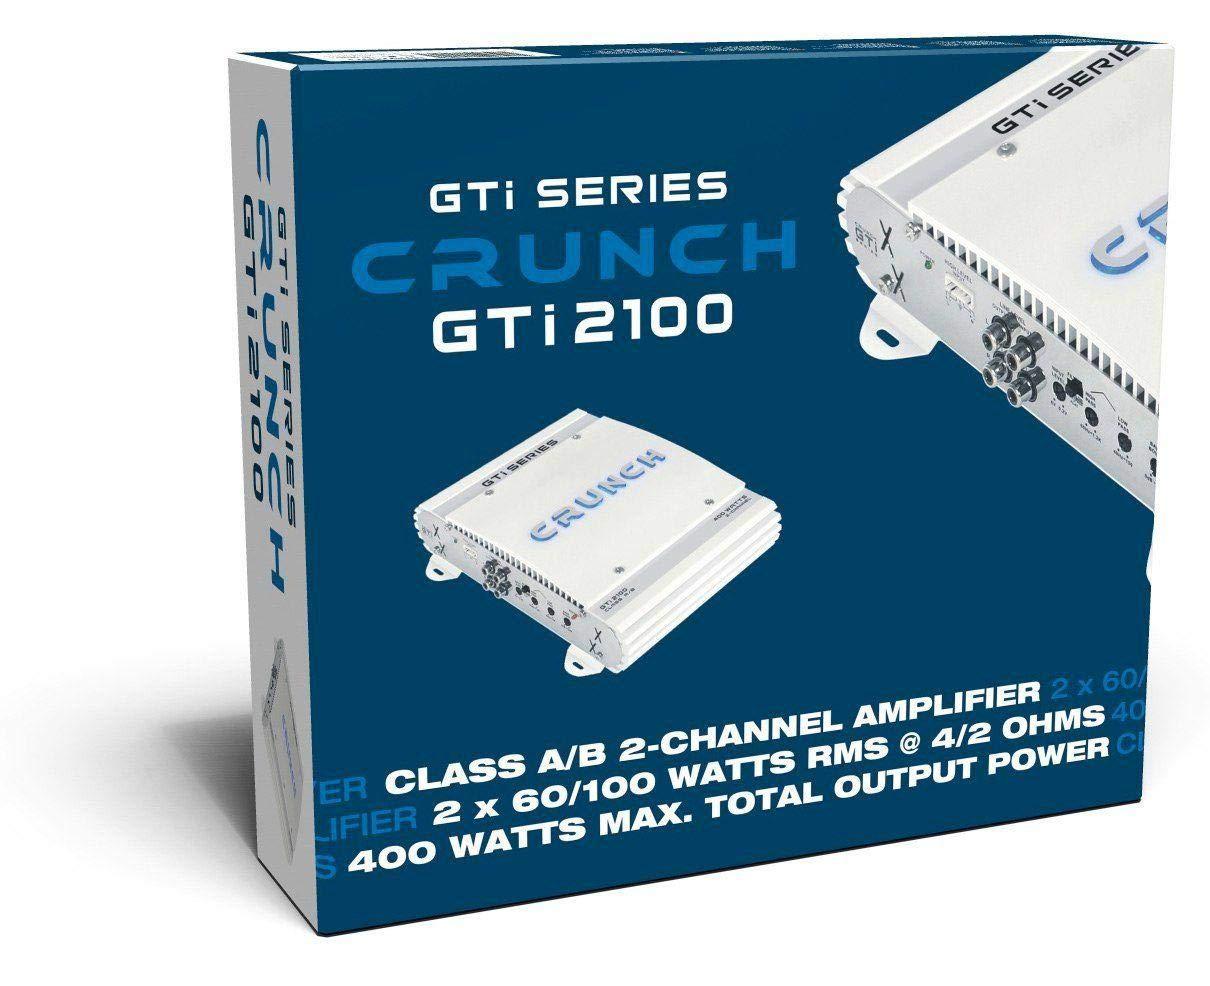 200 W, A//B, 0-12 dB, 100 W, 400 W, 200 W Crunch GTi2100 Car Wired Audioverst/ärker wei/ß